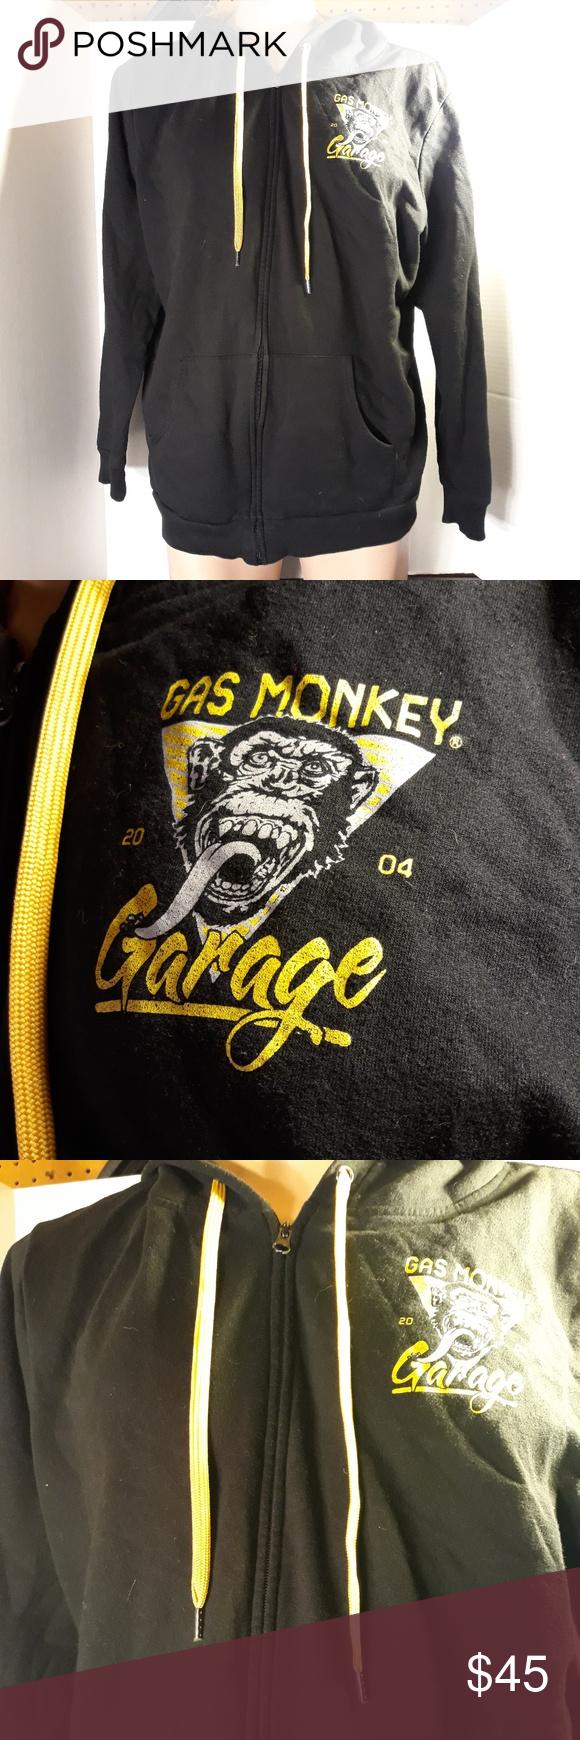 2004 Vintage Gas Monkey Garage Hoodie No rips or stains Gas Monkey Garage Shirts Sweatshirts & Hoodies #gasmonkeygarage